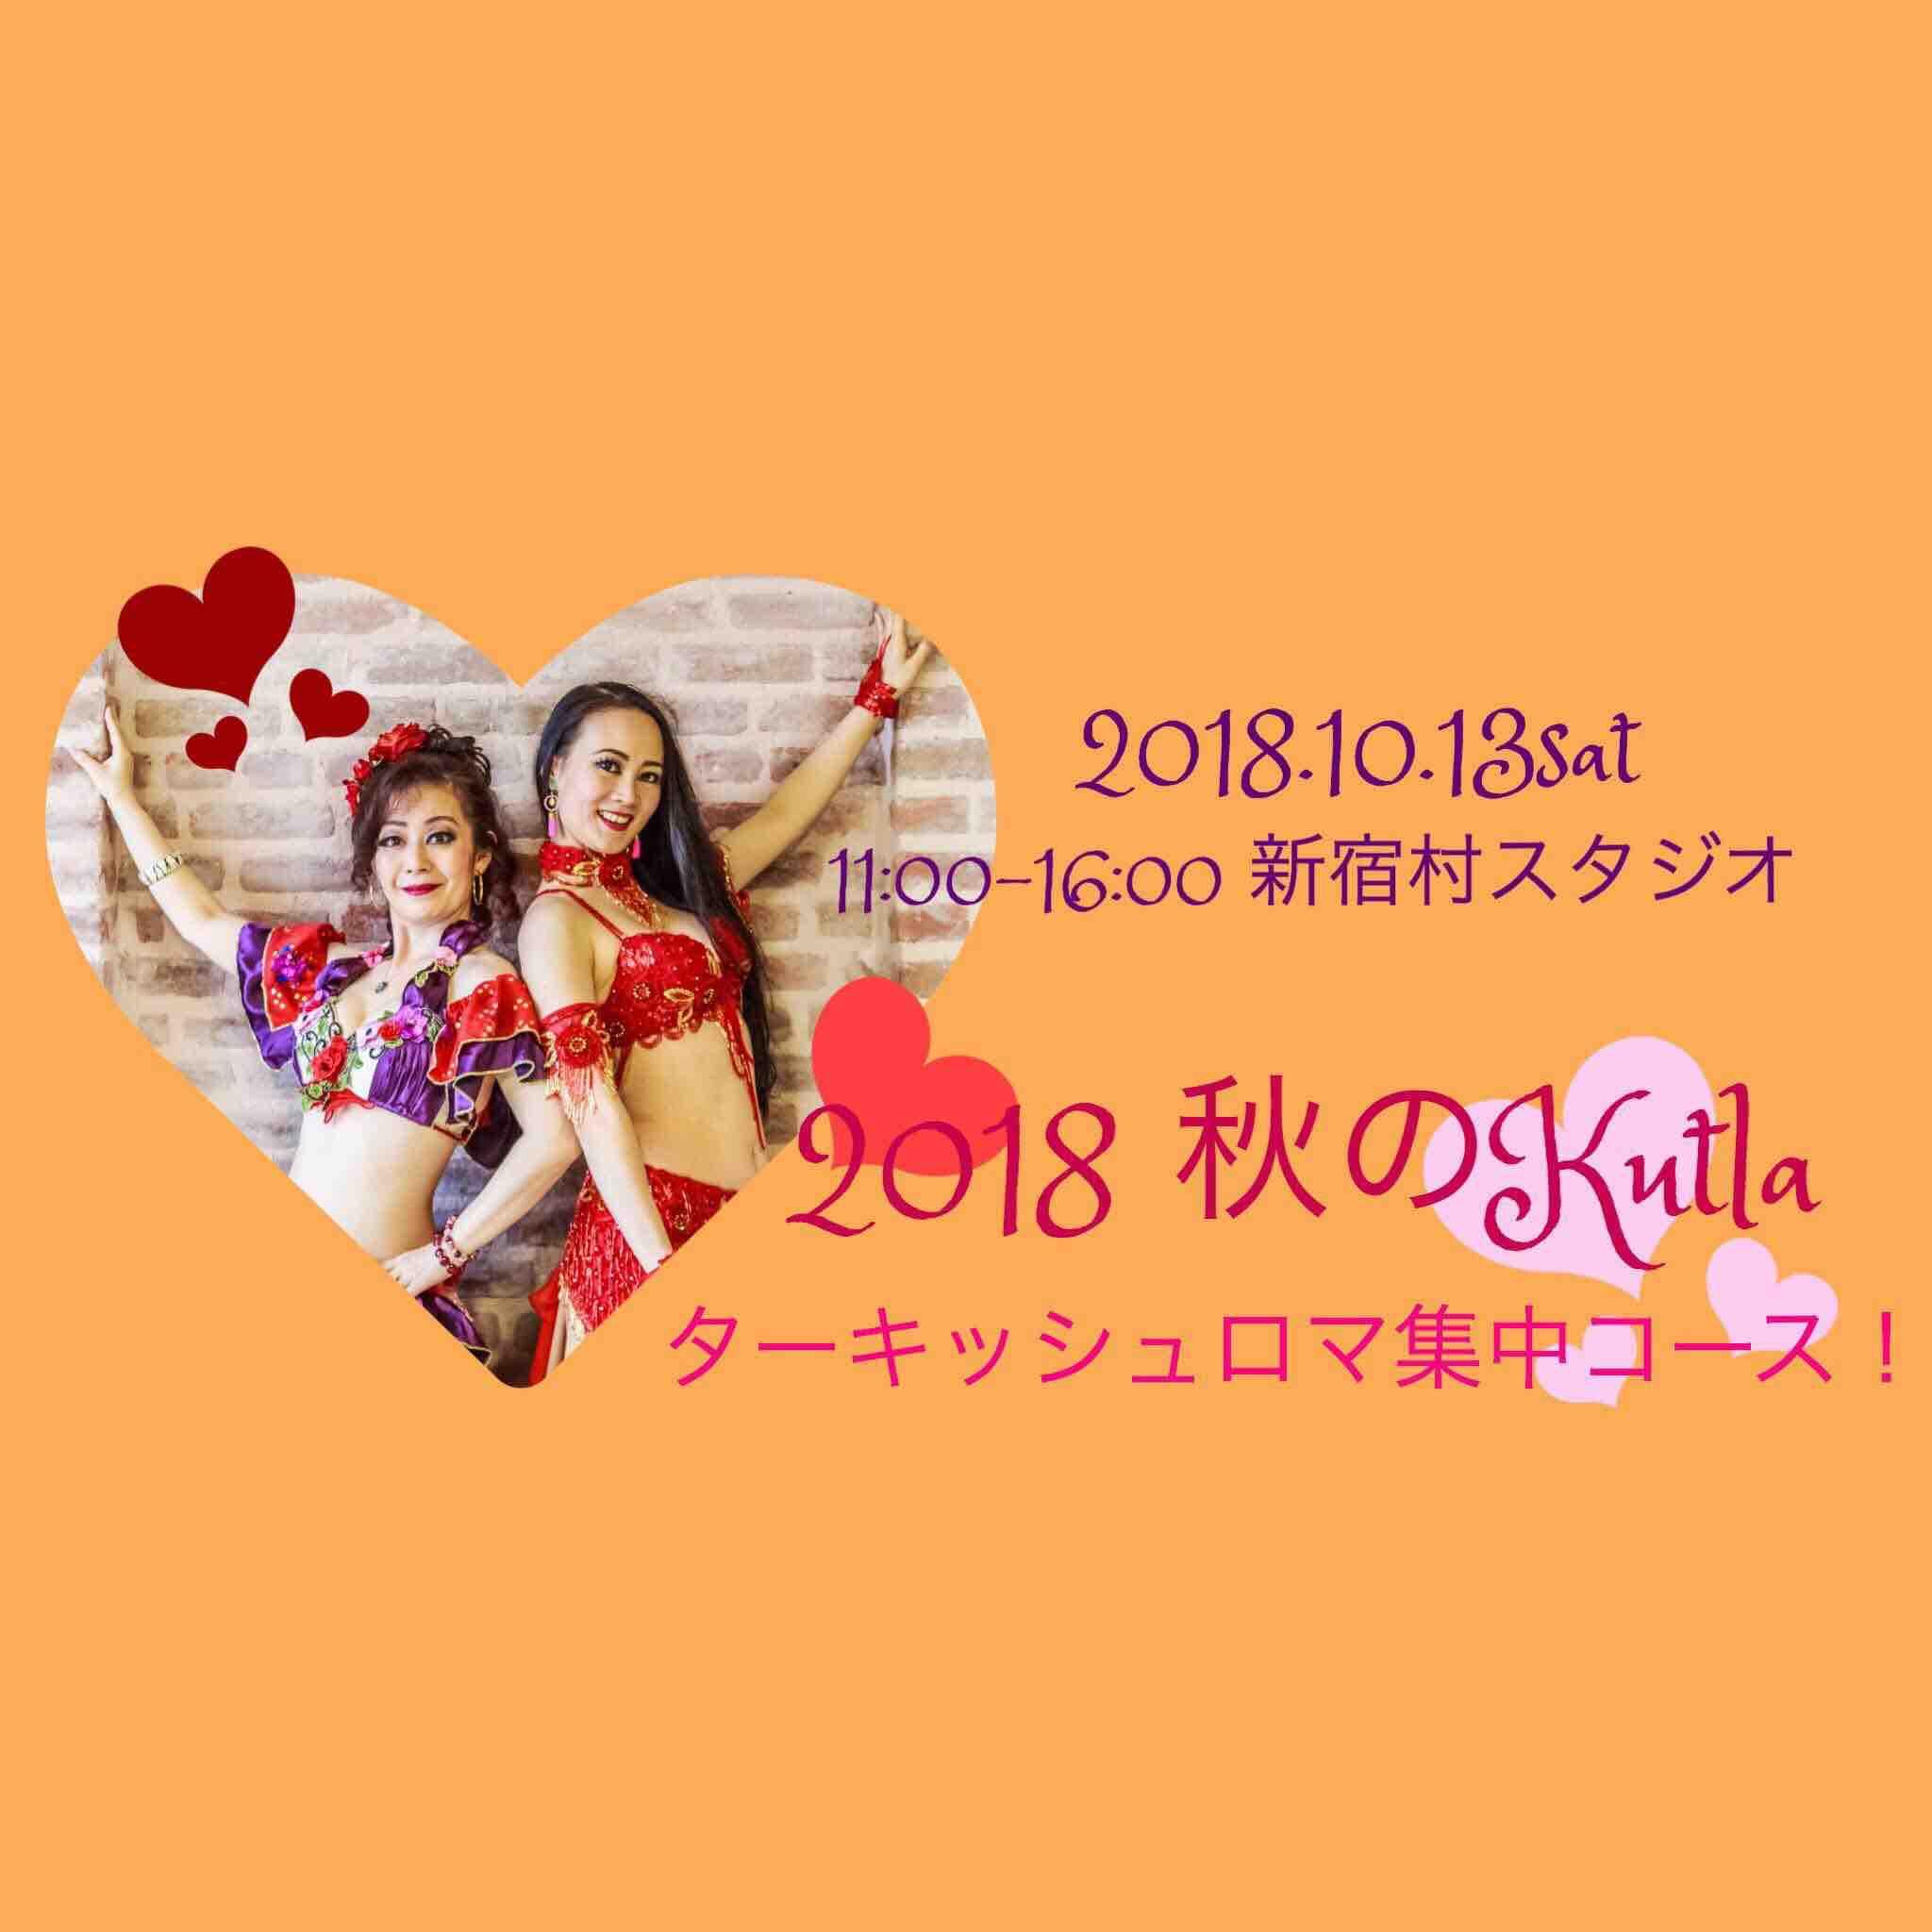 fc2blog_20180802123733608.jpg